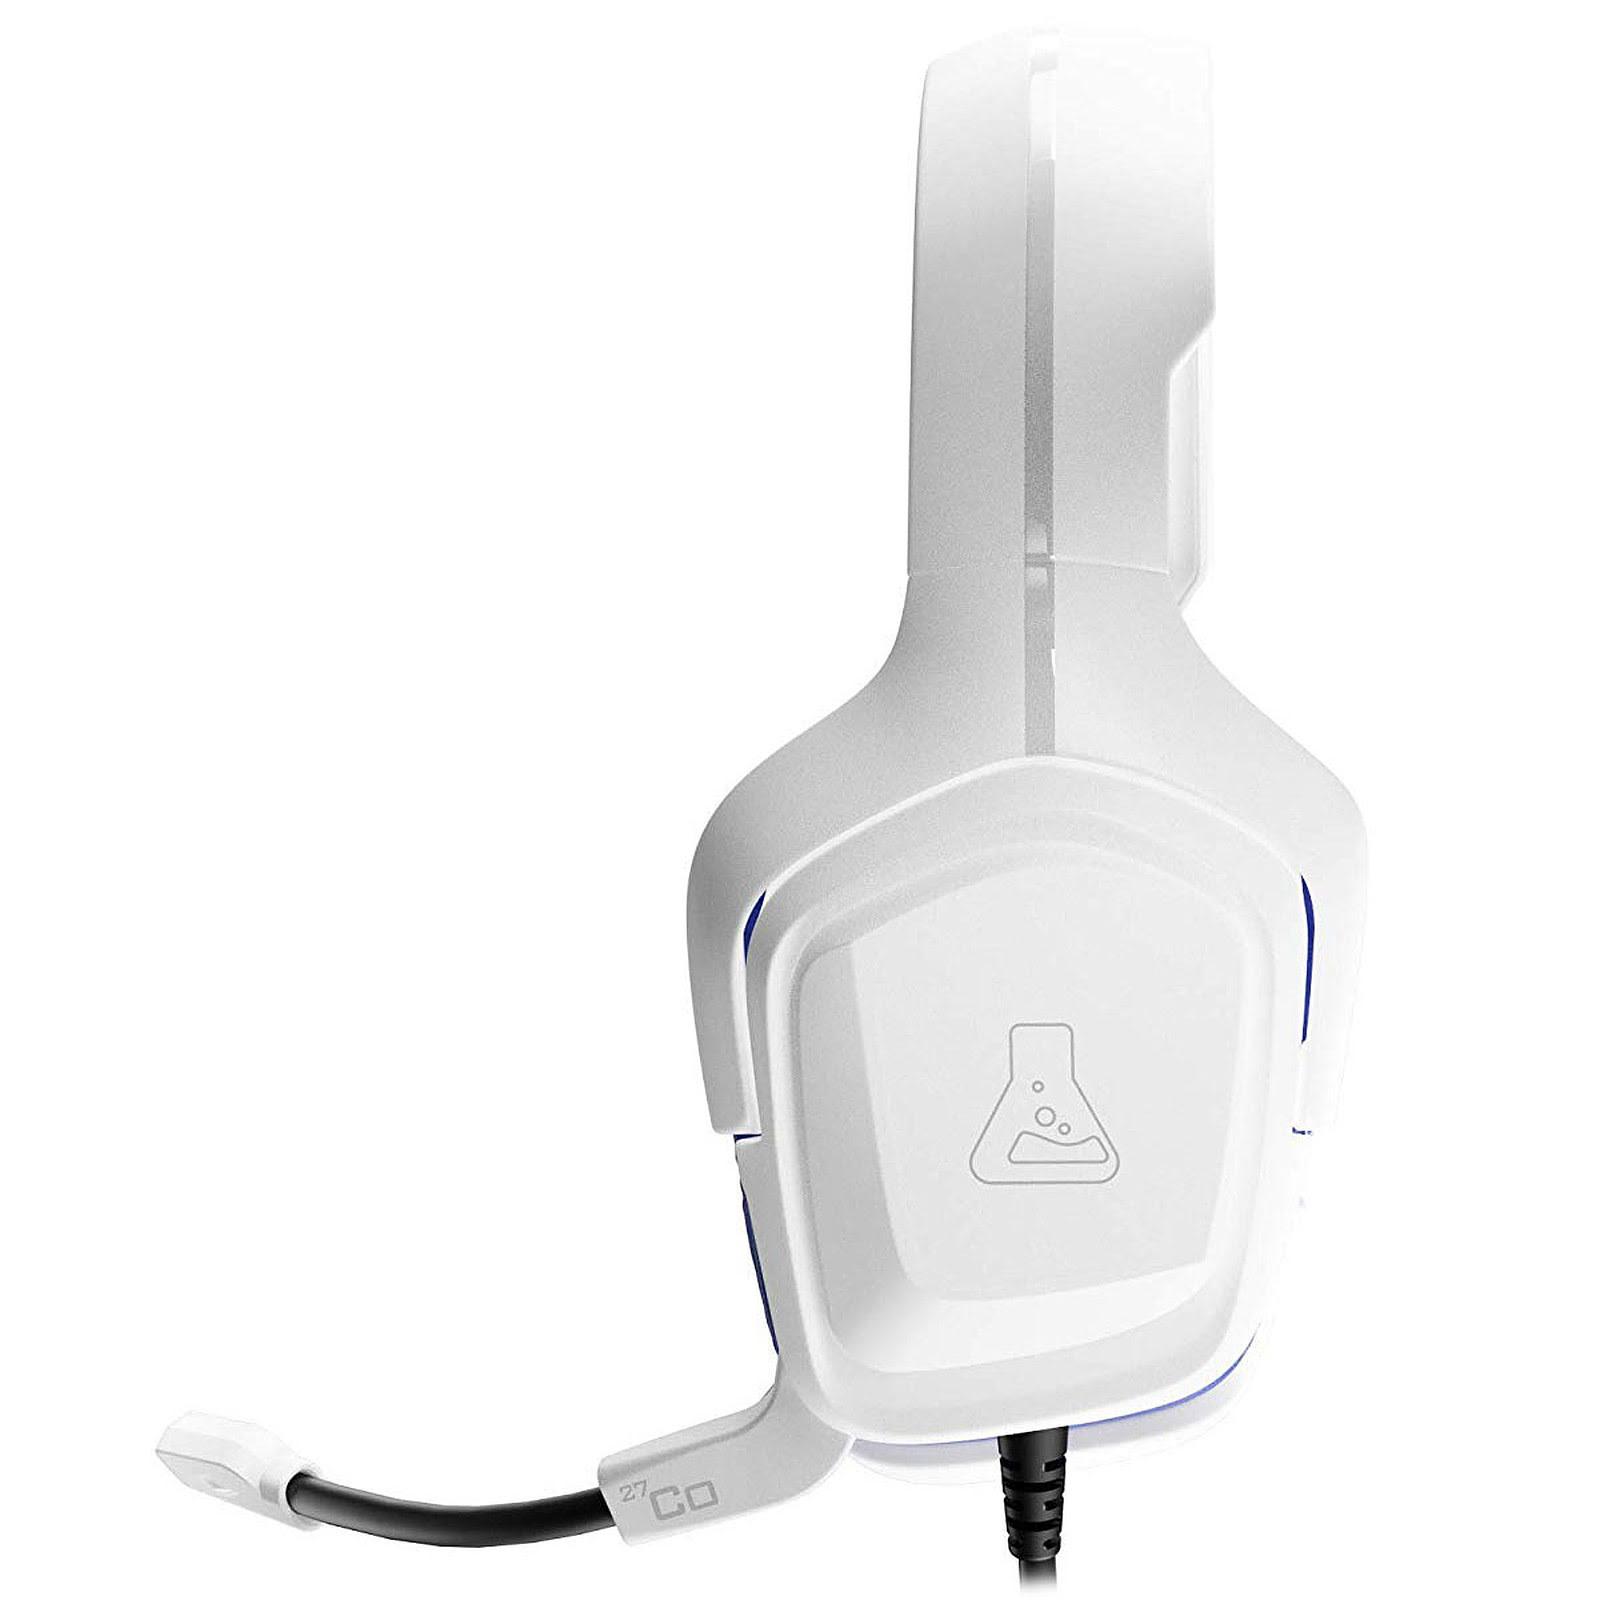 KORP COBALT Blanc (KORP-COBALT-W) - Achat / Vente Micro-casque sur Picata.fr - 1